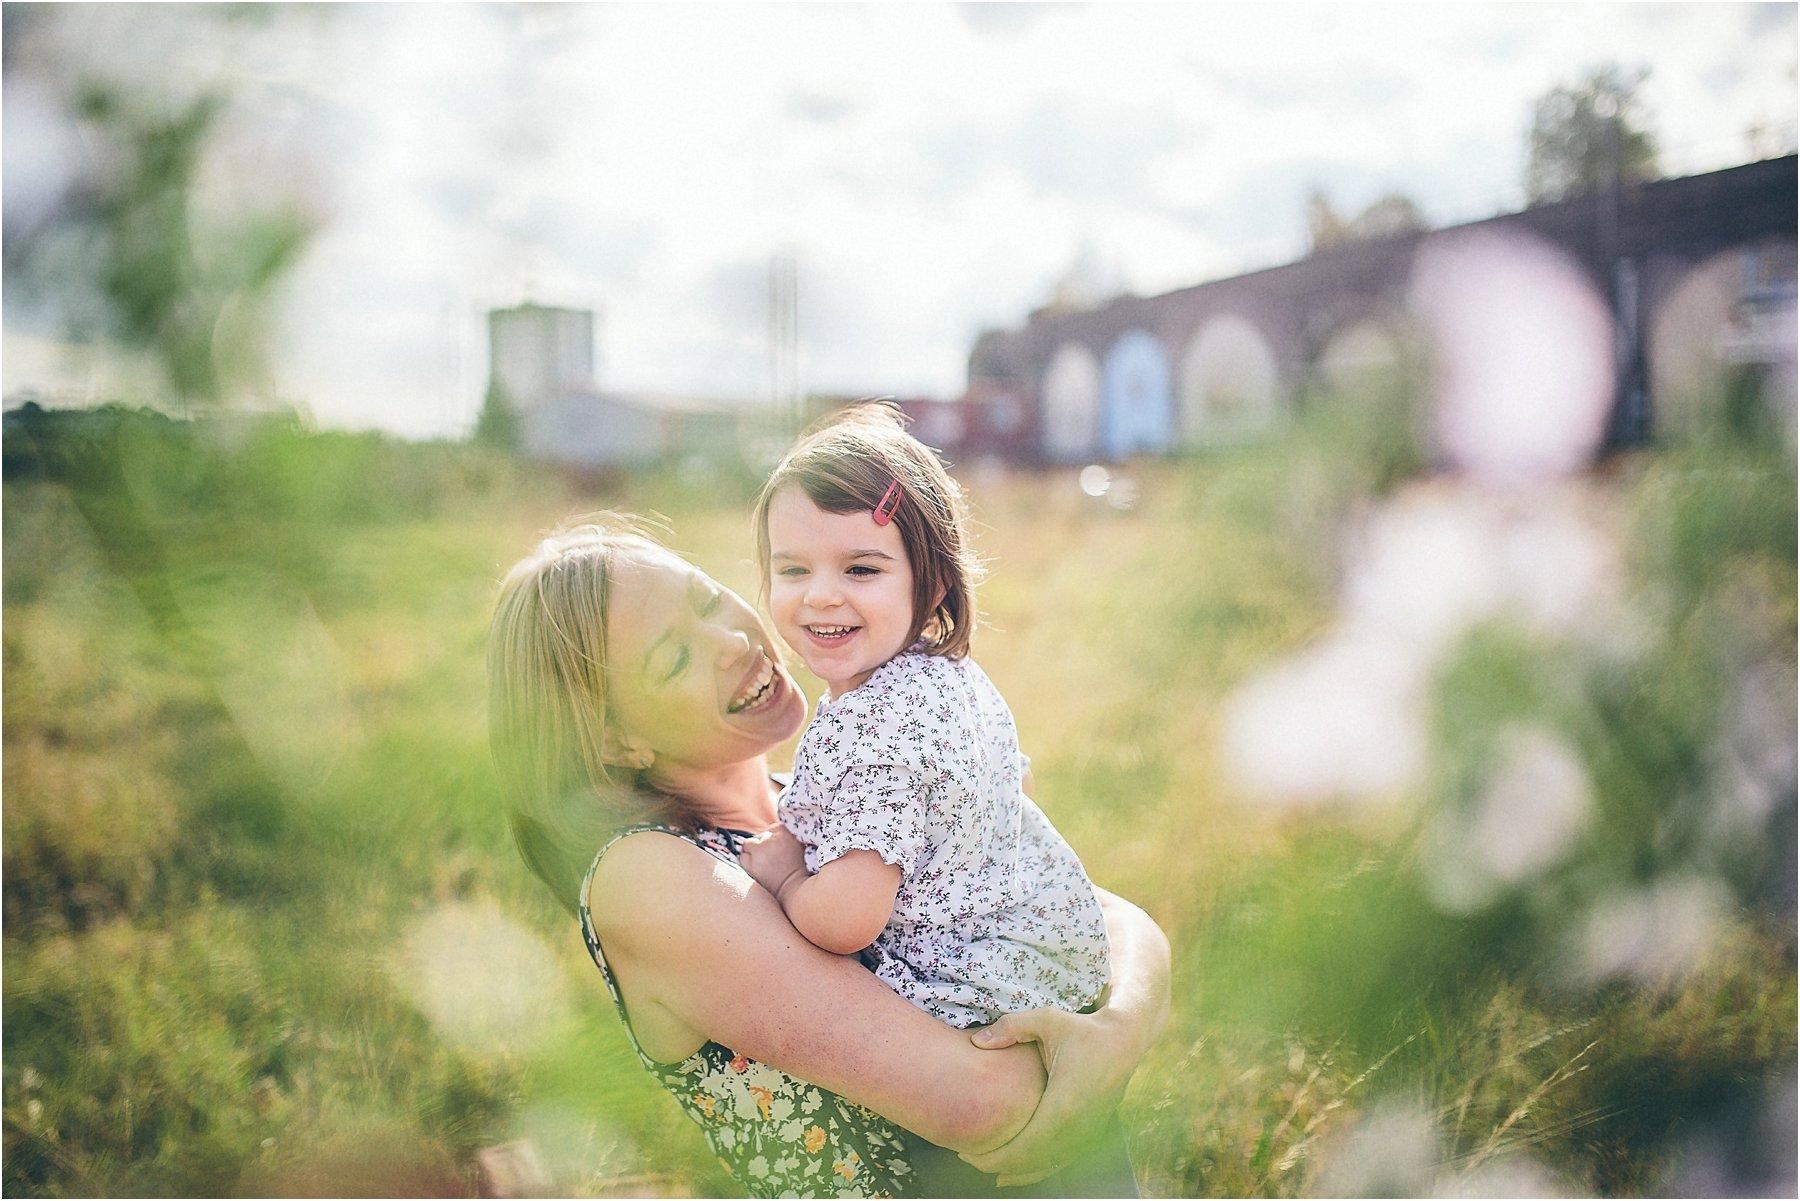 Leeds_Family_Photography_0010